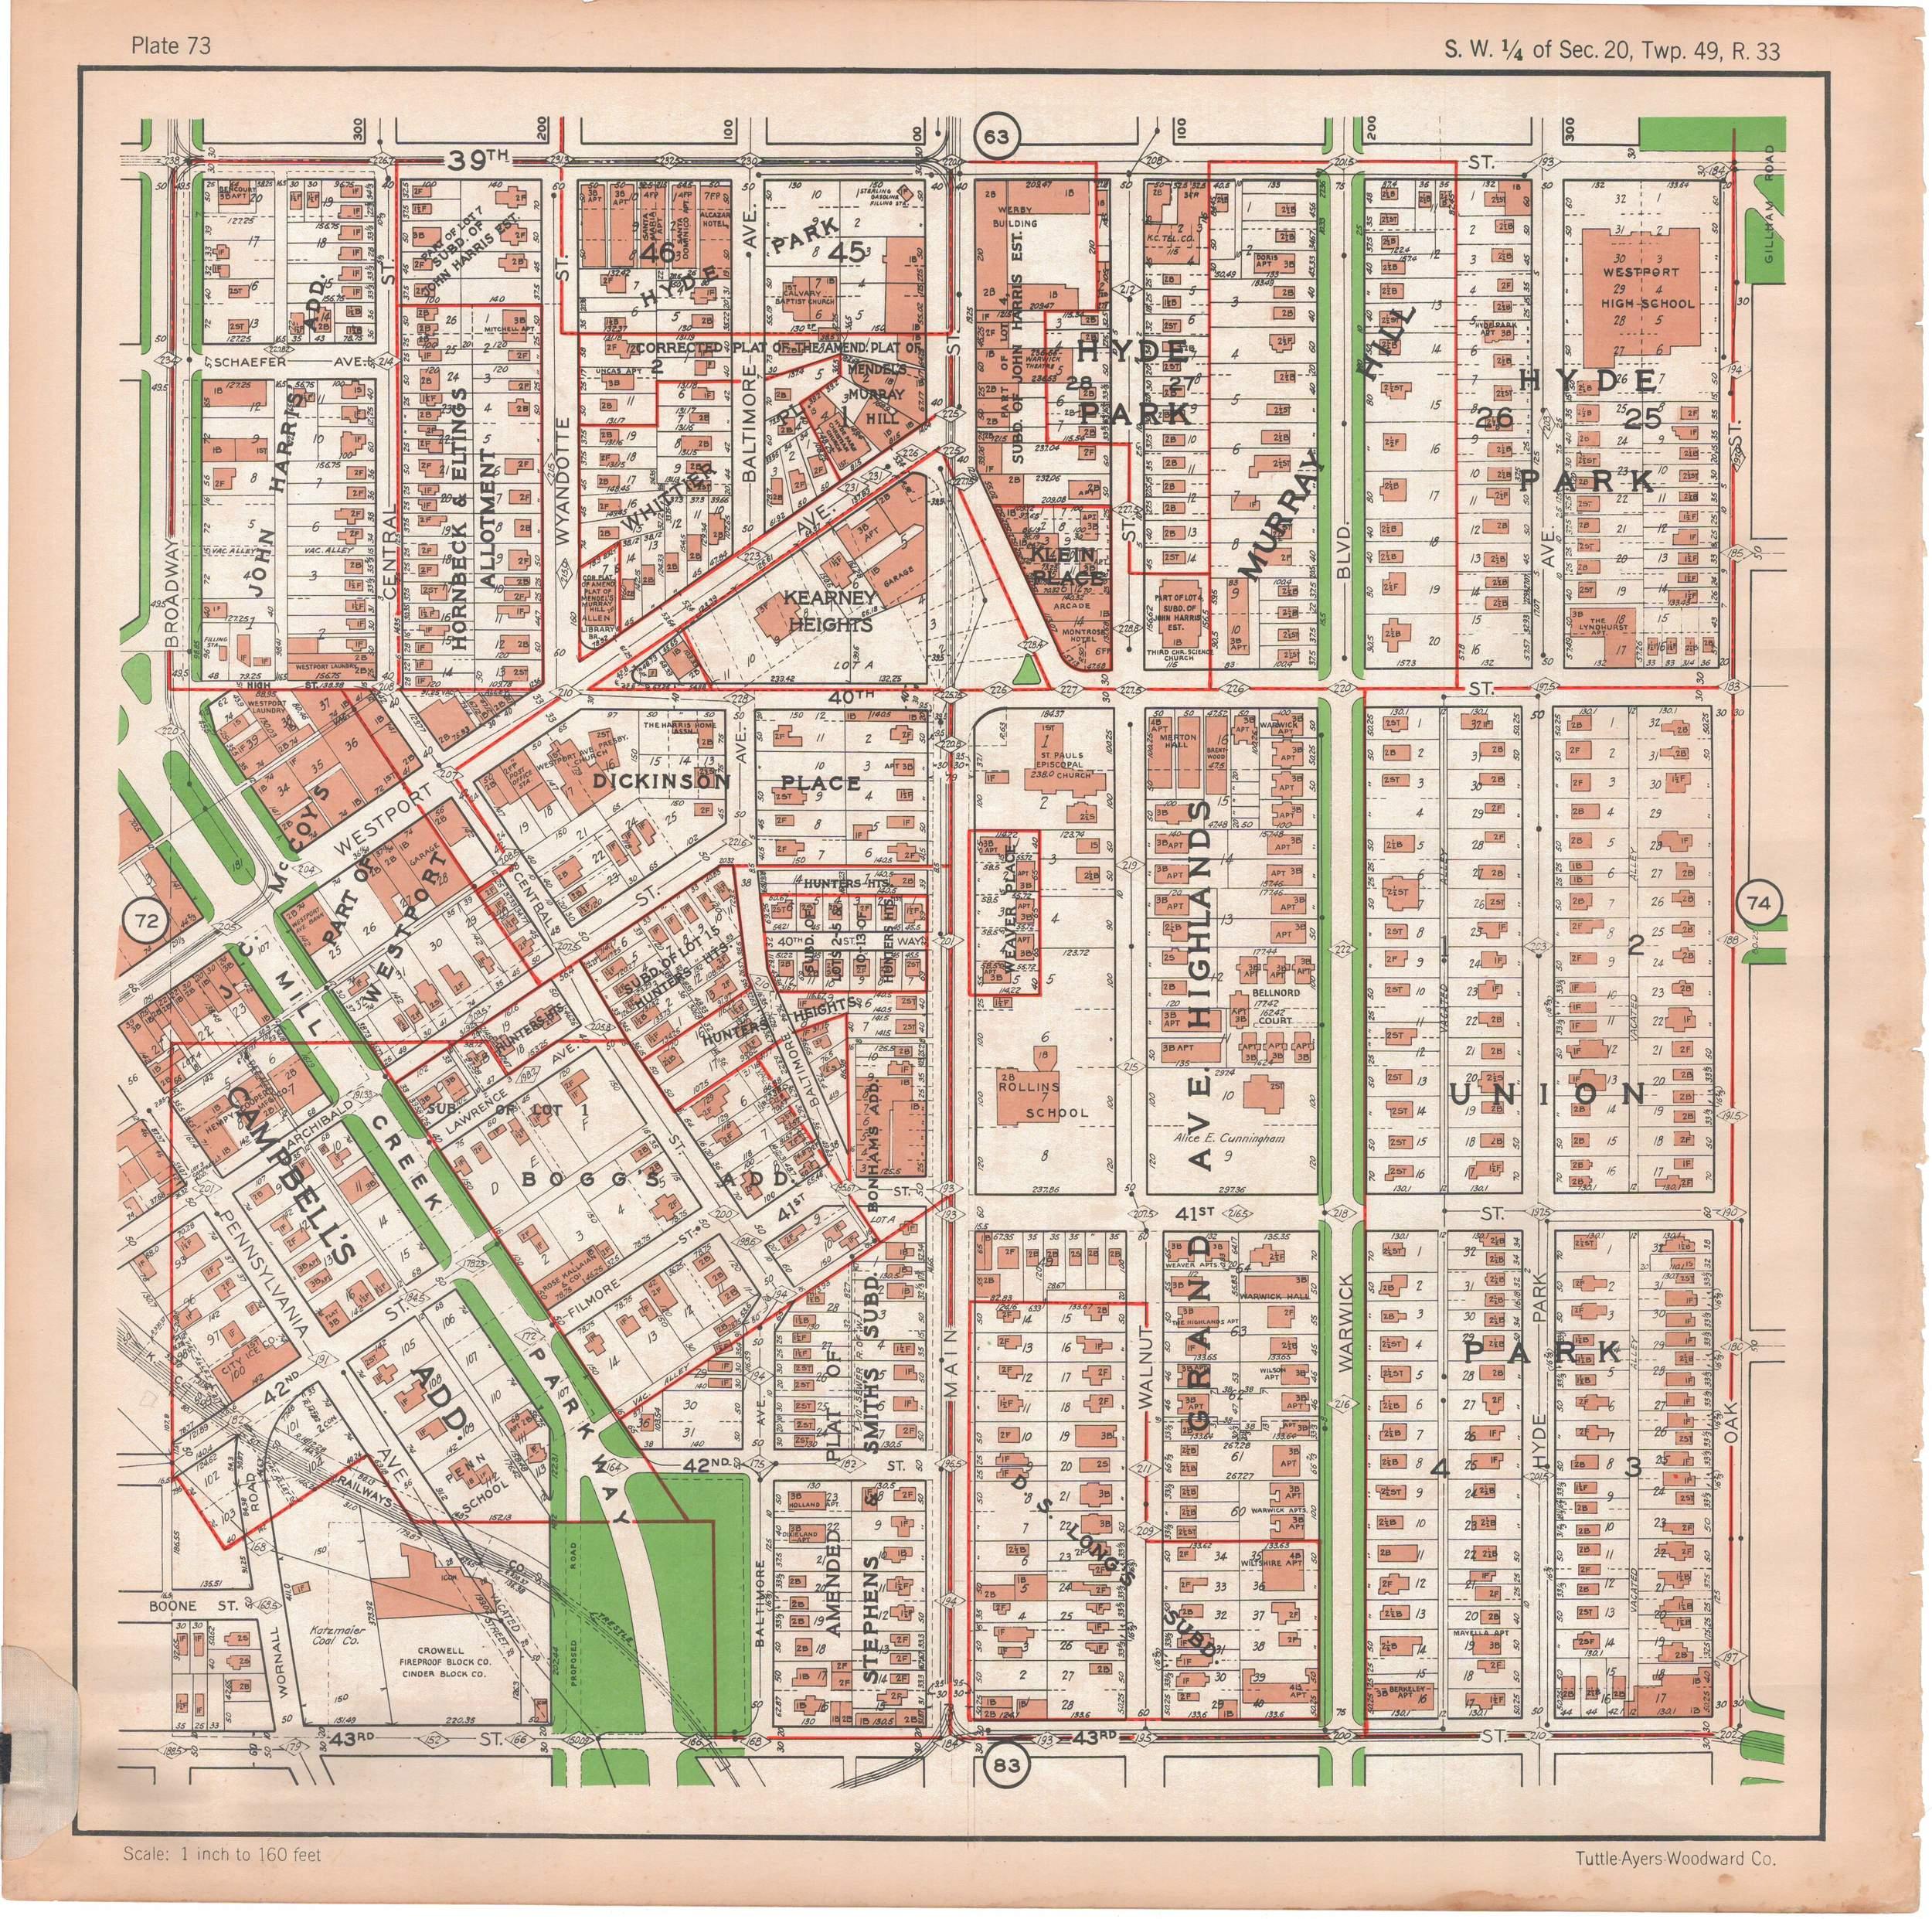 1925 TUTTLE_AYERS_Plate 73.JPG